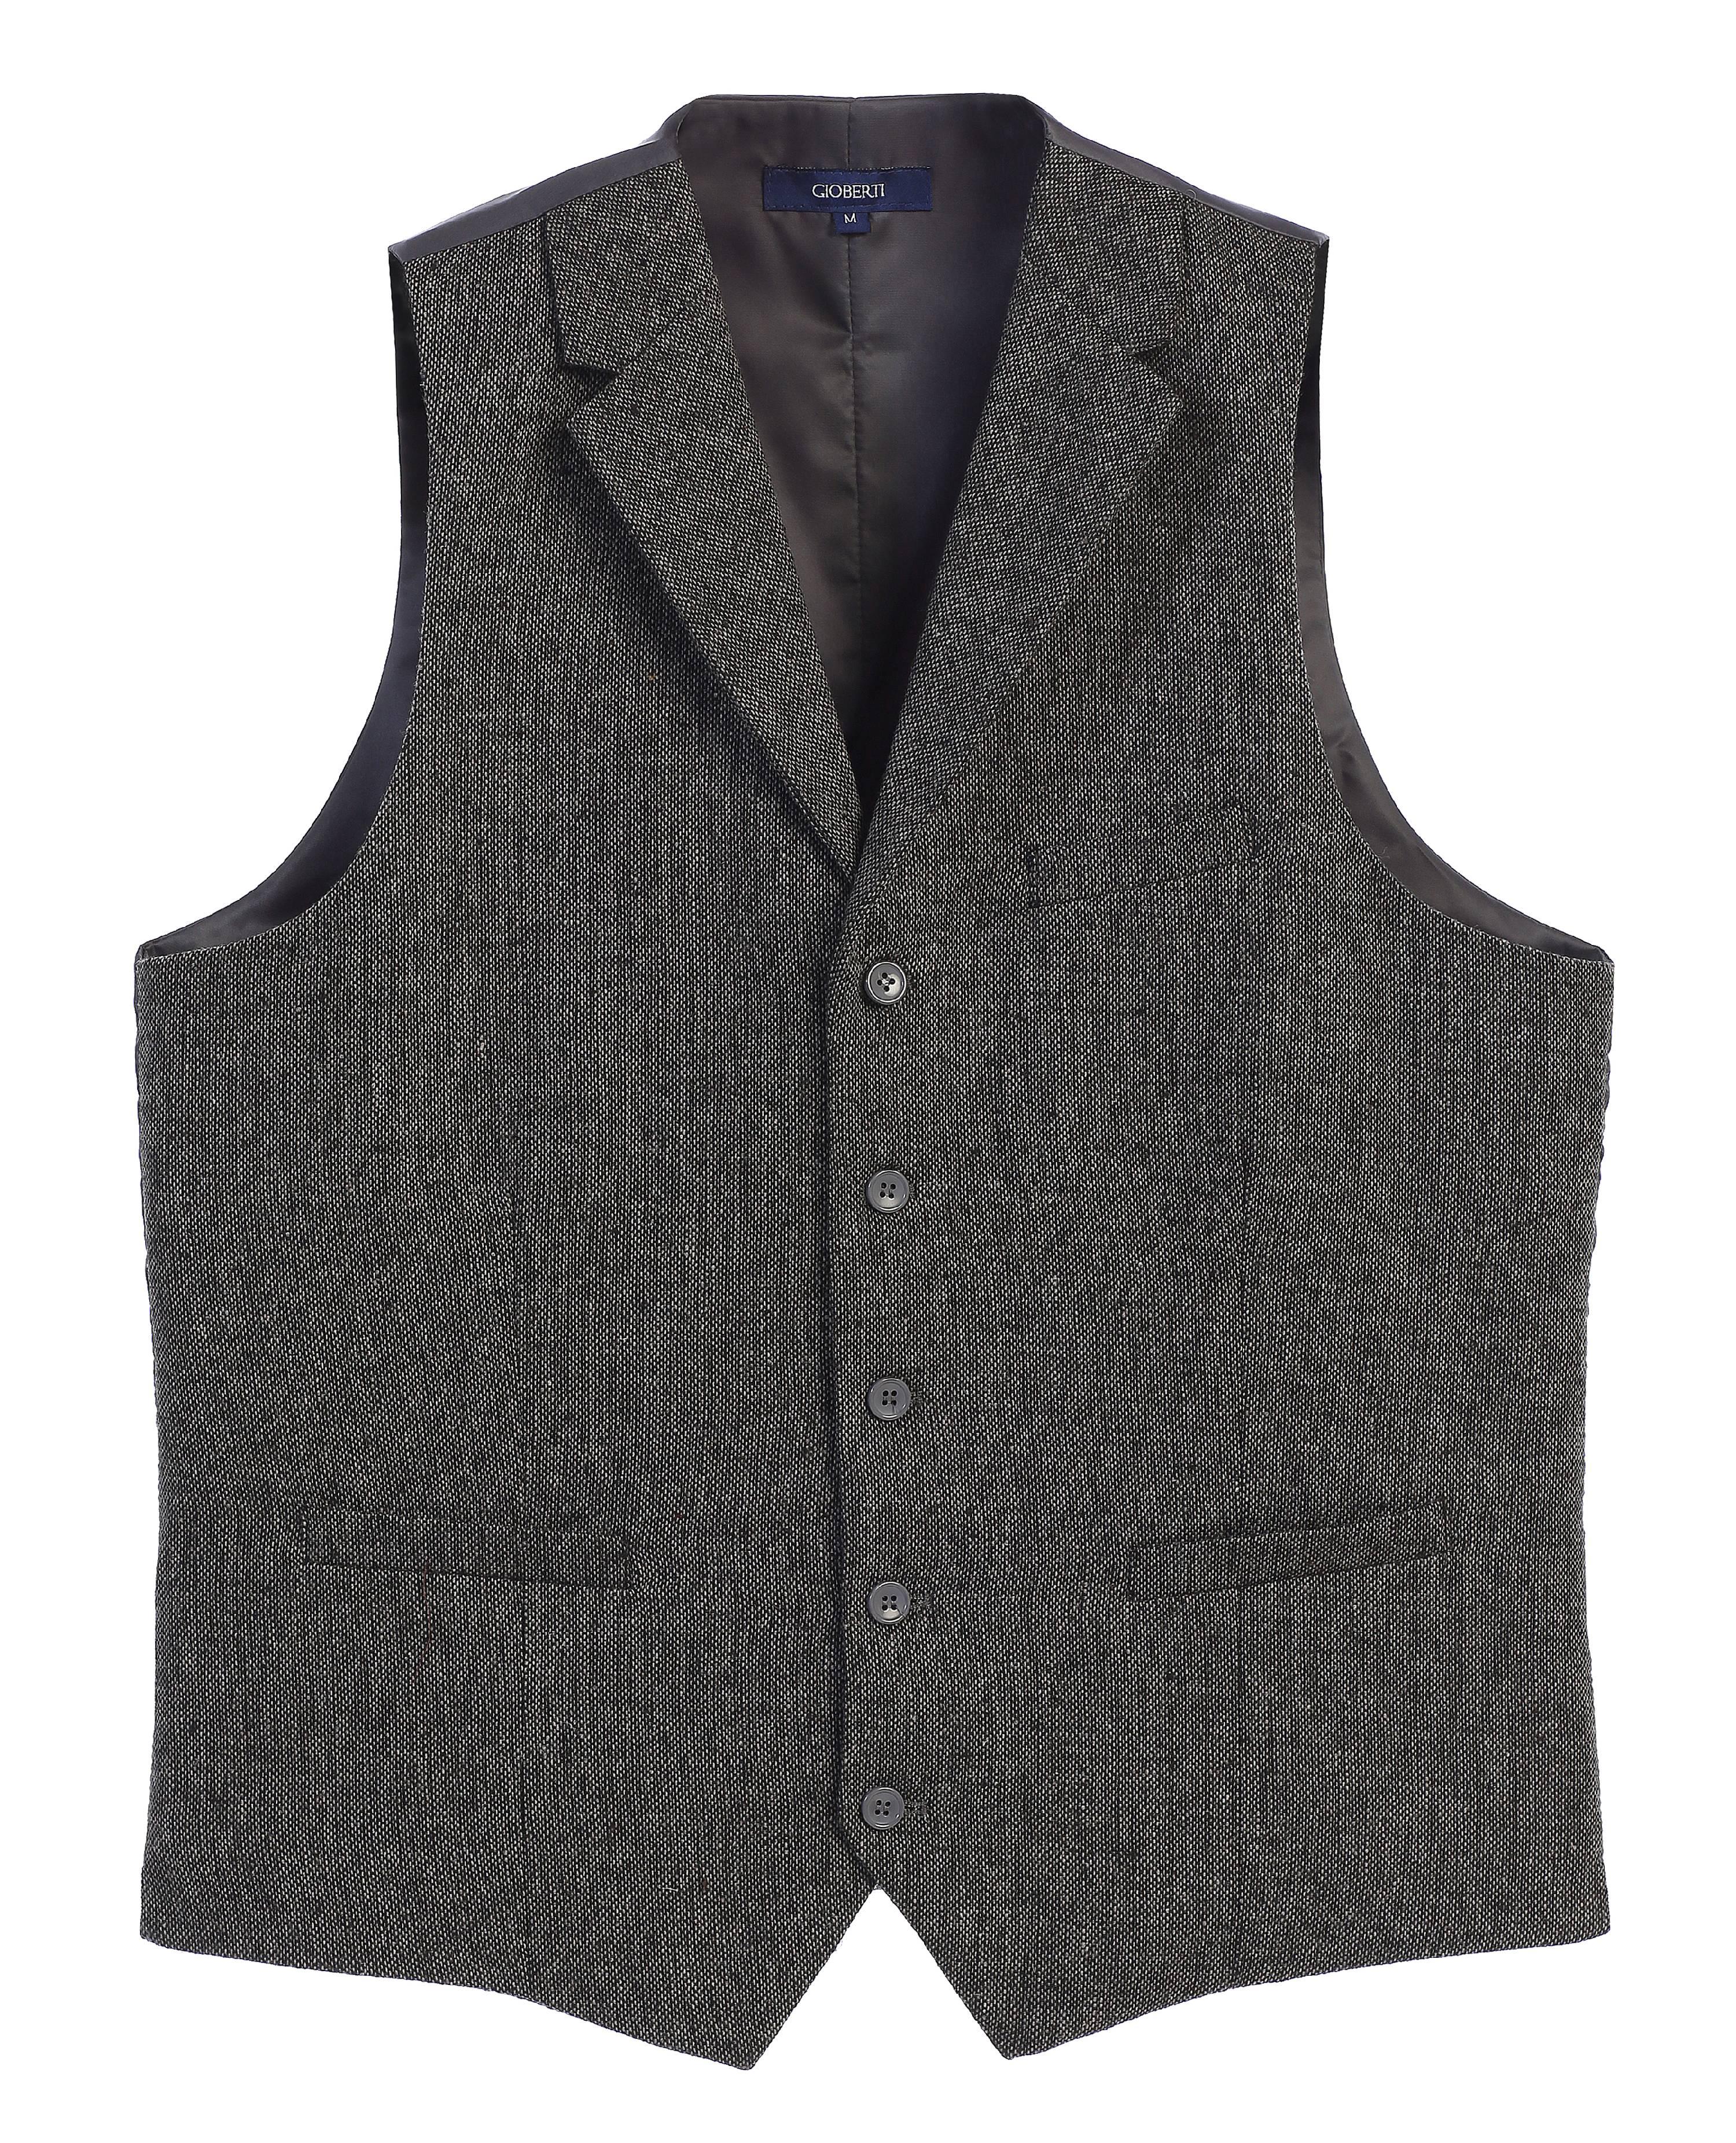 Gioberti Men's 5 Button Tailored Collar Formal Tweed Suit Vest